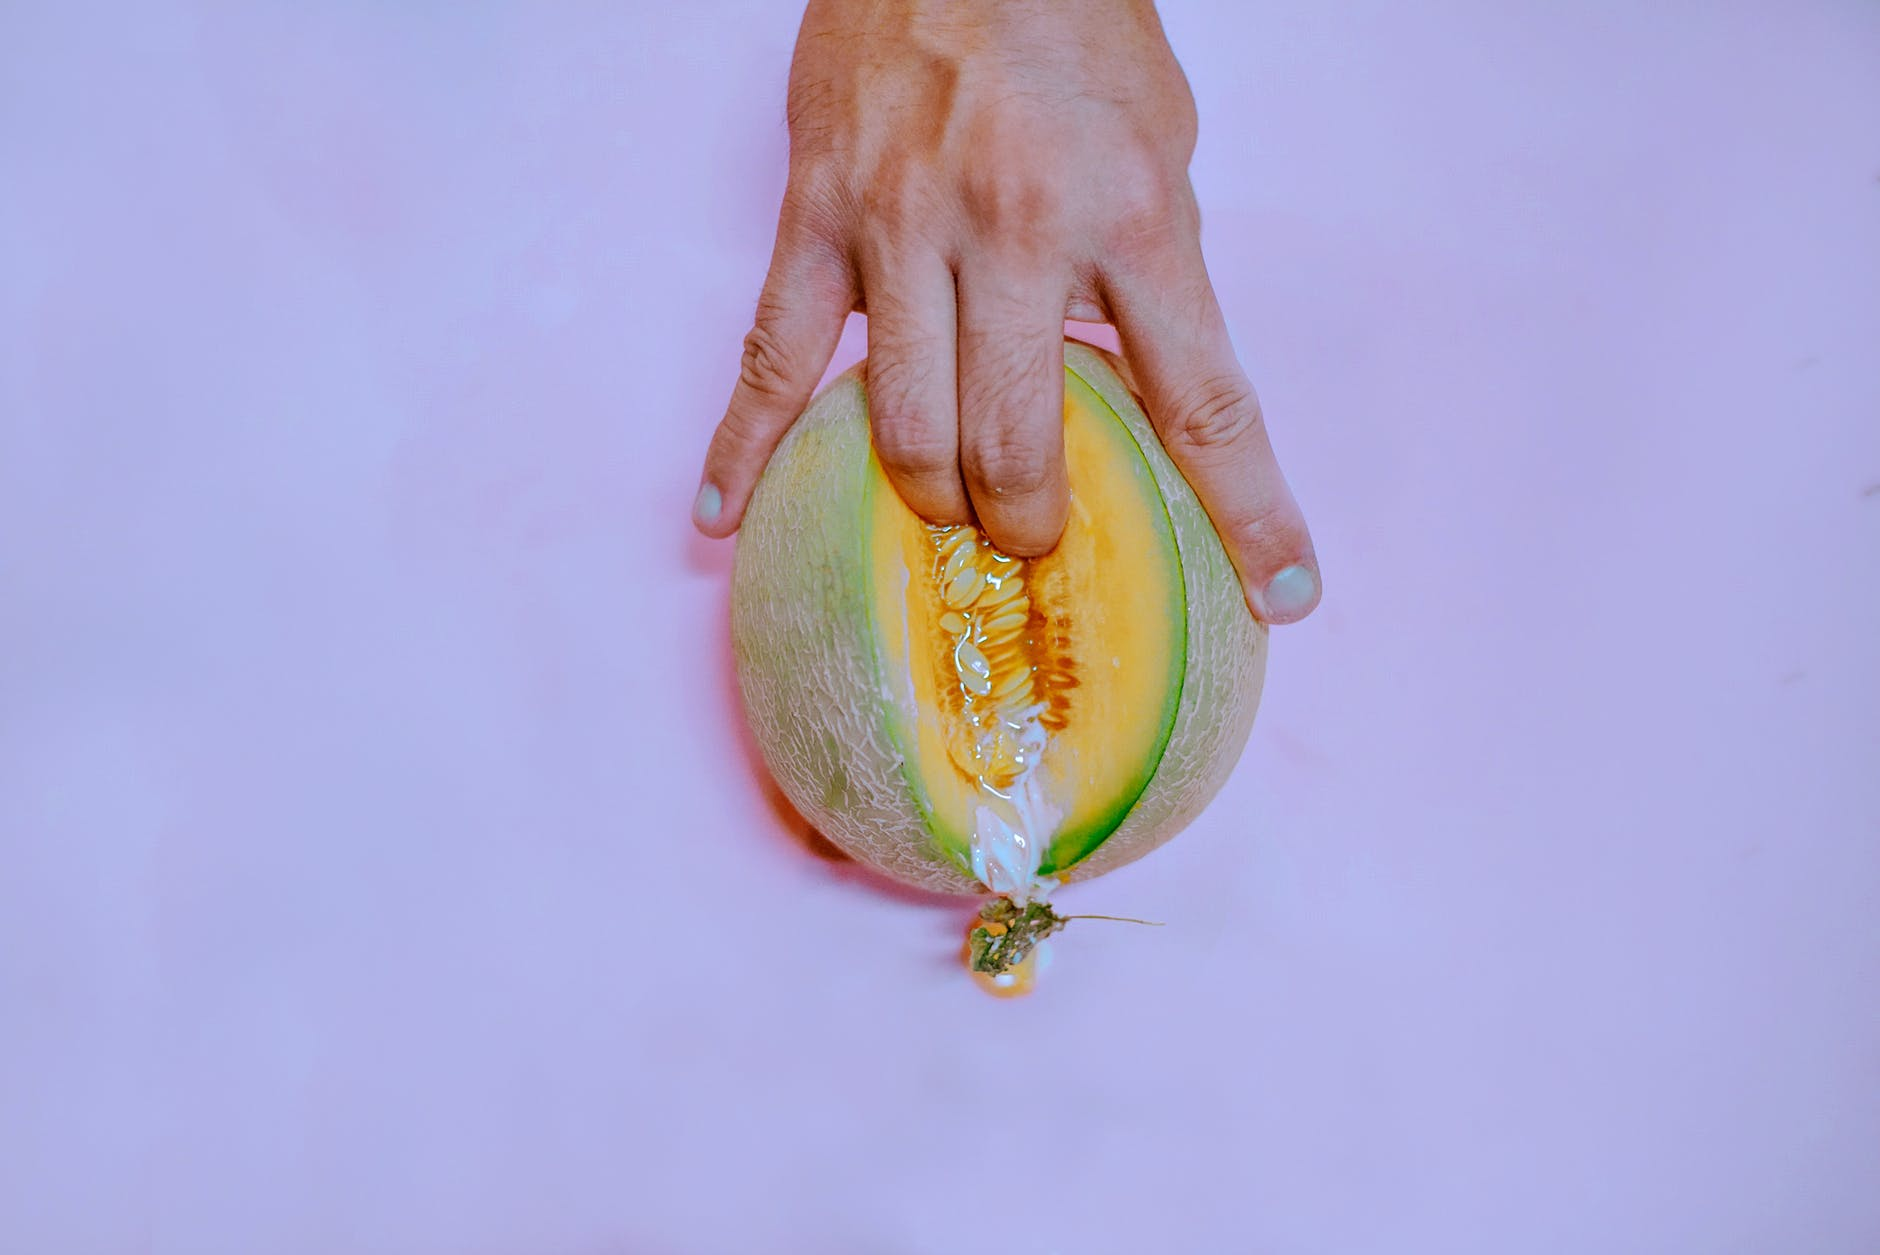 fingers on melon